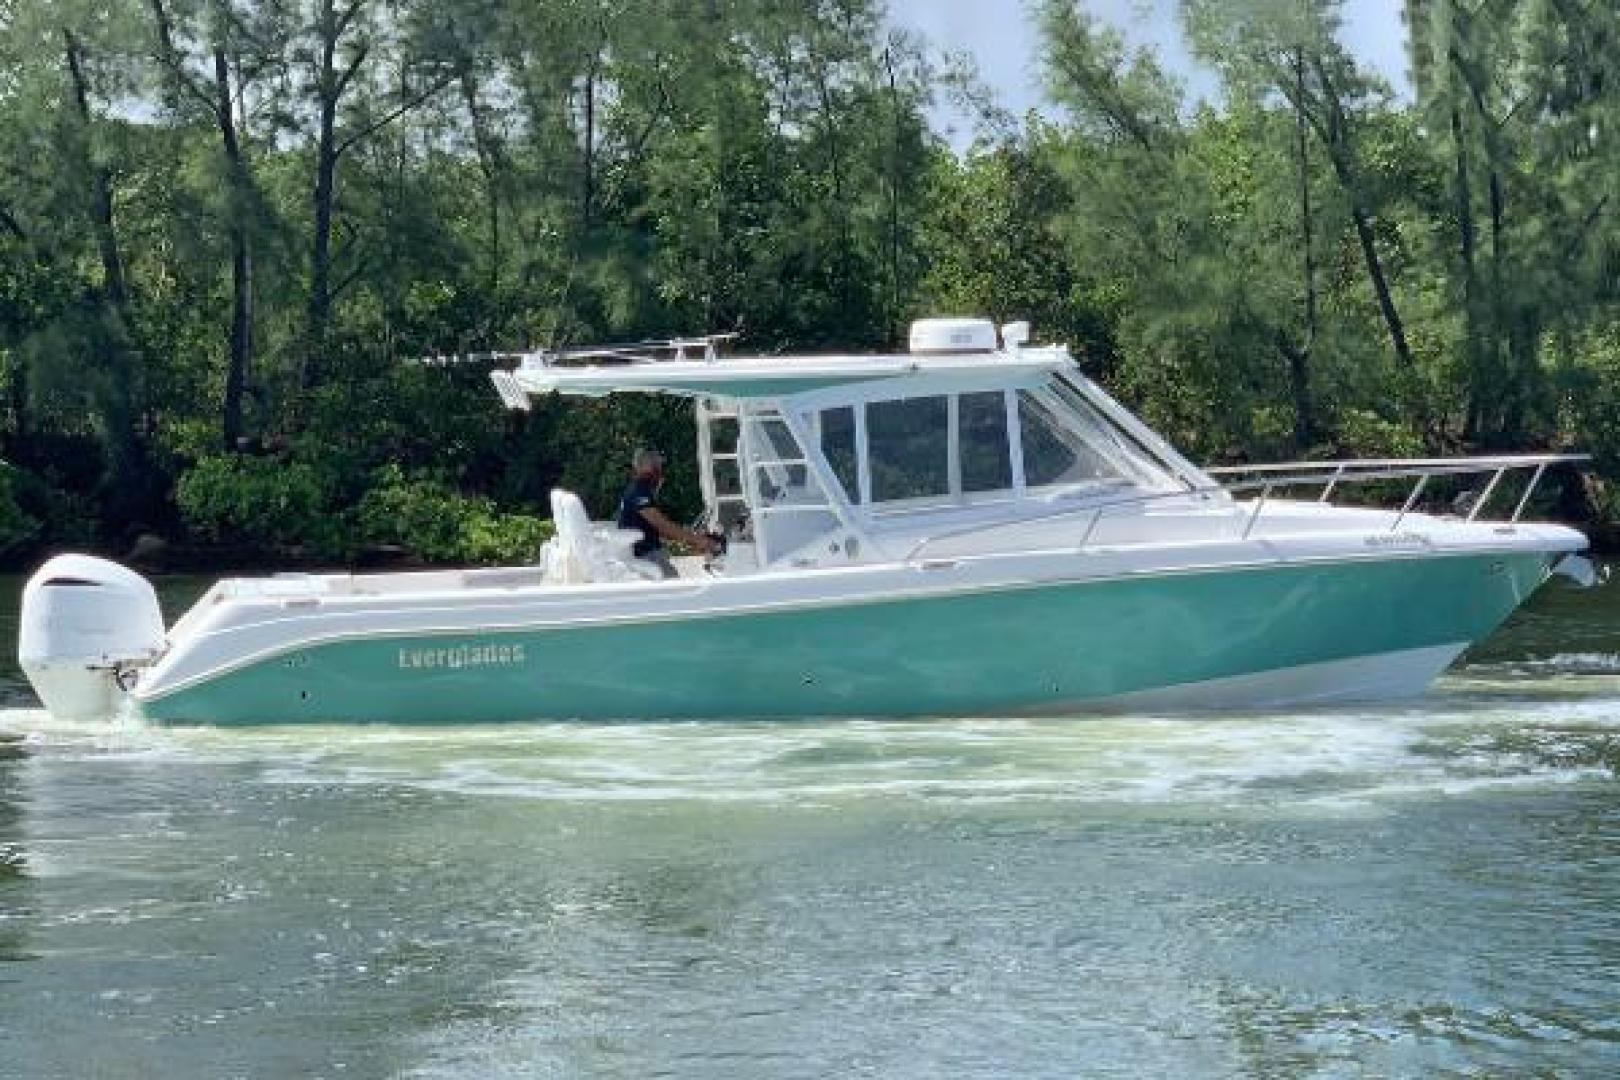 Everglades-350LX 2016-Everglades 350LX Fort Lauderdale-Florida-United States-1530948 | Thumbnail